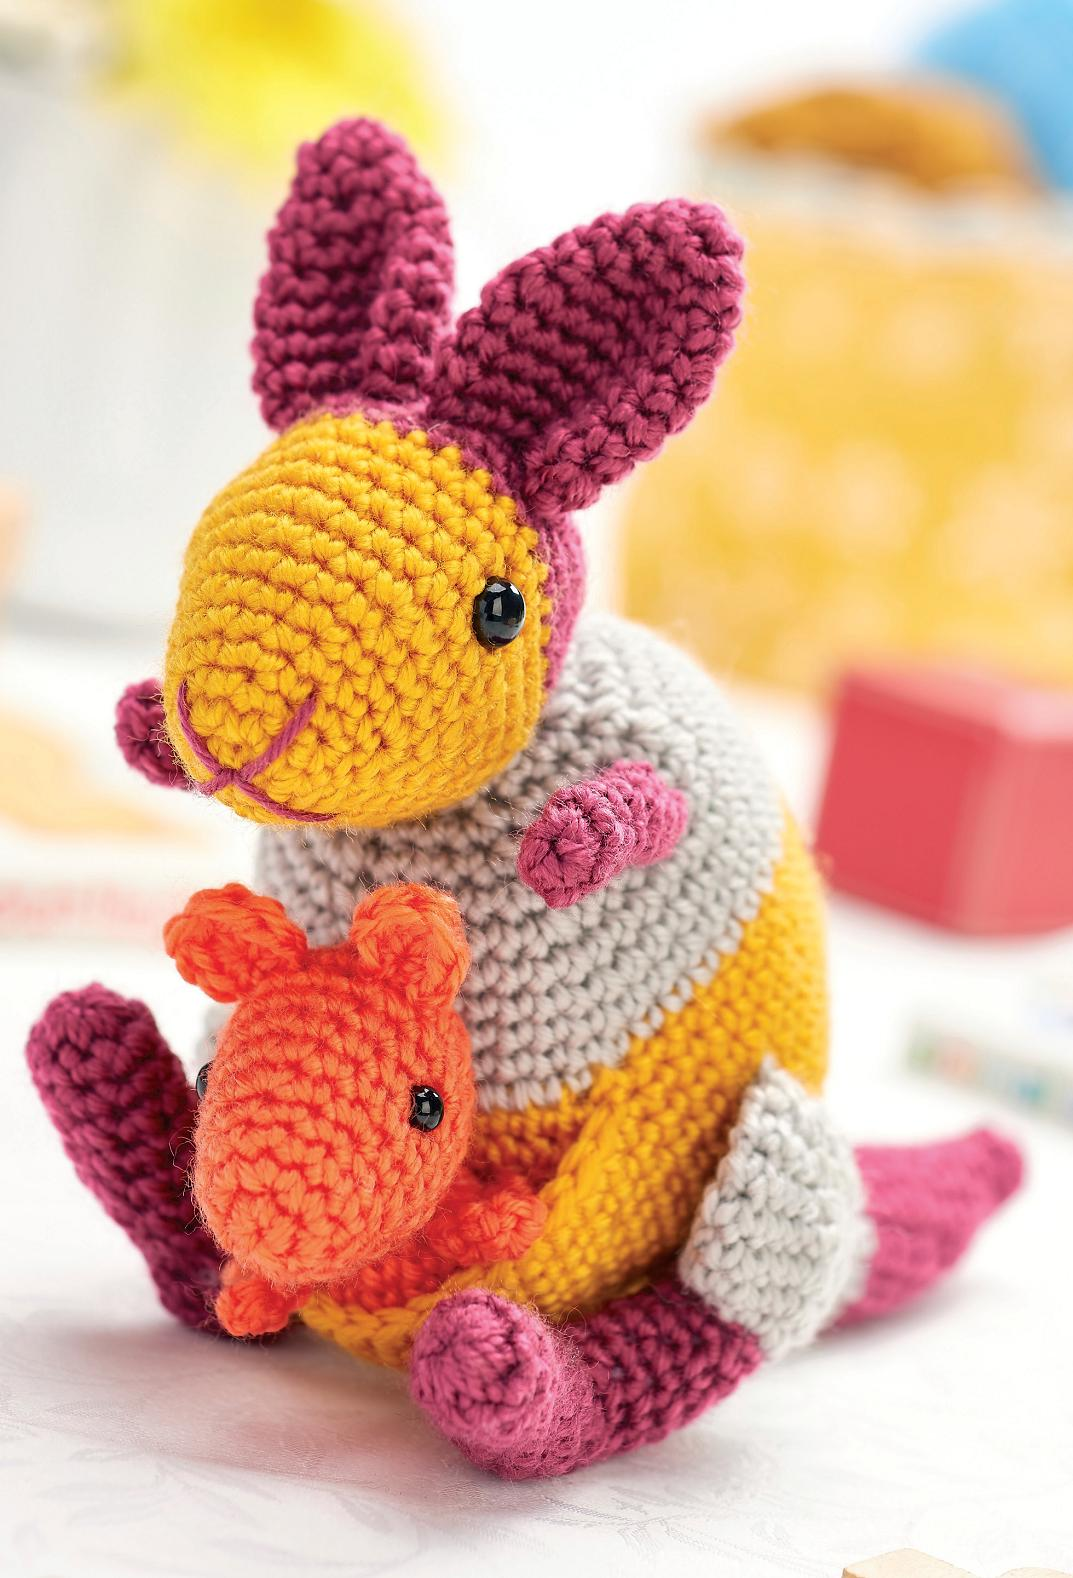 Kangaroo and joey Crochet Pattern